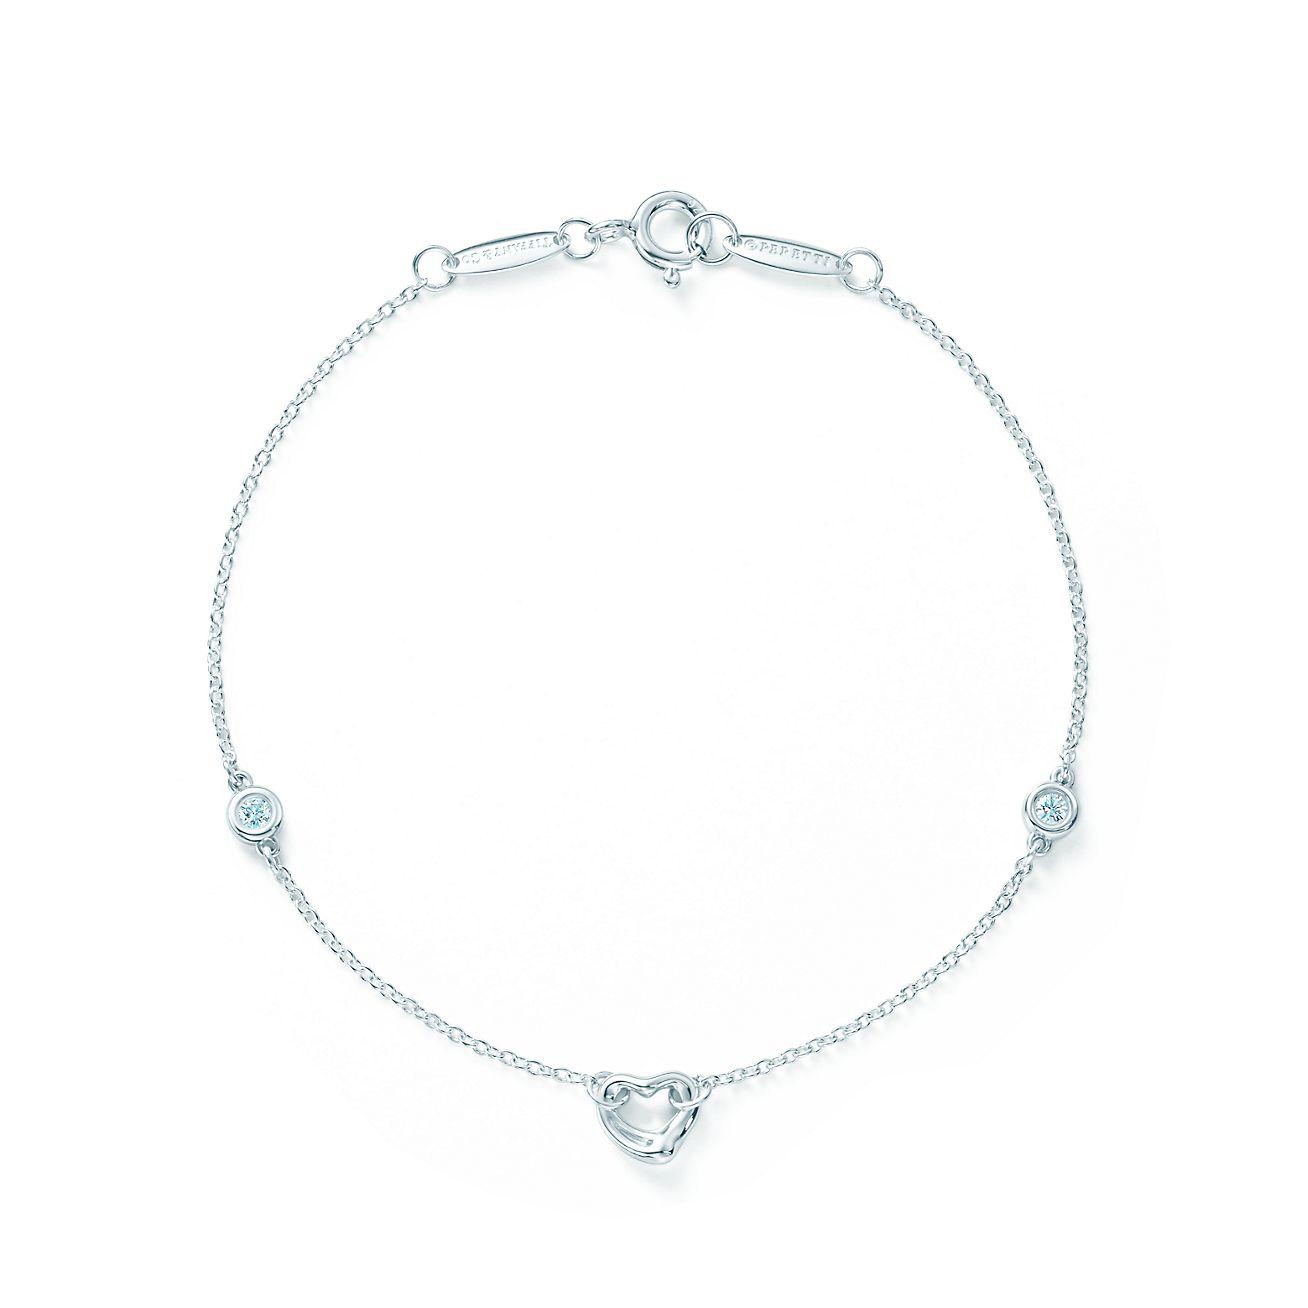 Elsa Peretti Diamonds by the Yard necklace in sterling silver Tiffany & Co. CvkE6o2oz